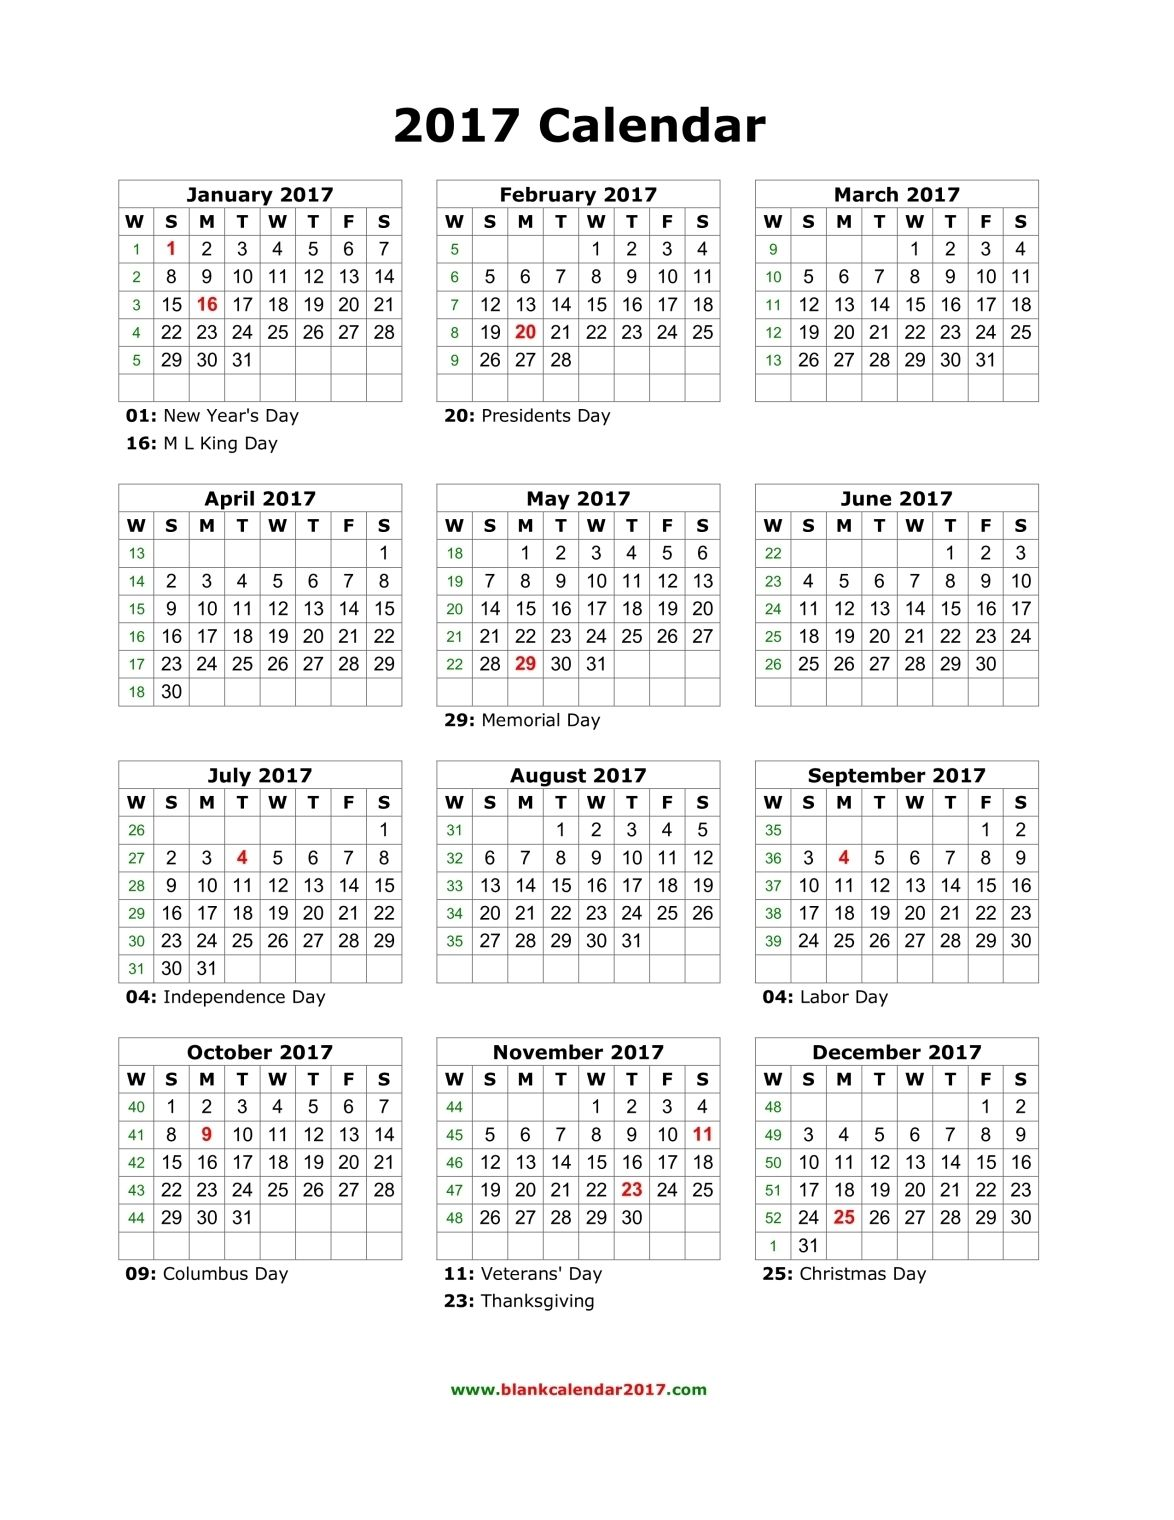 Blank Holidays Calendar  Portrait  Print  Cut